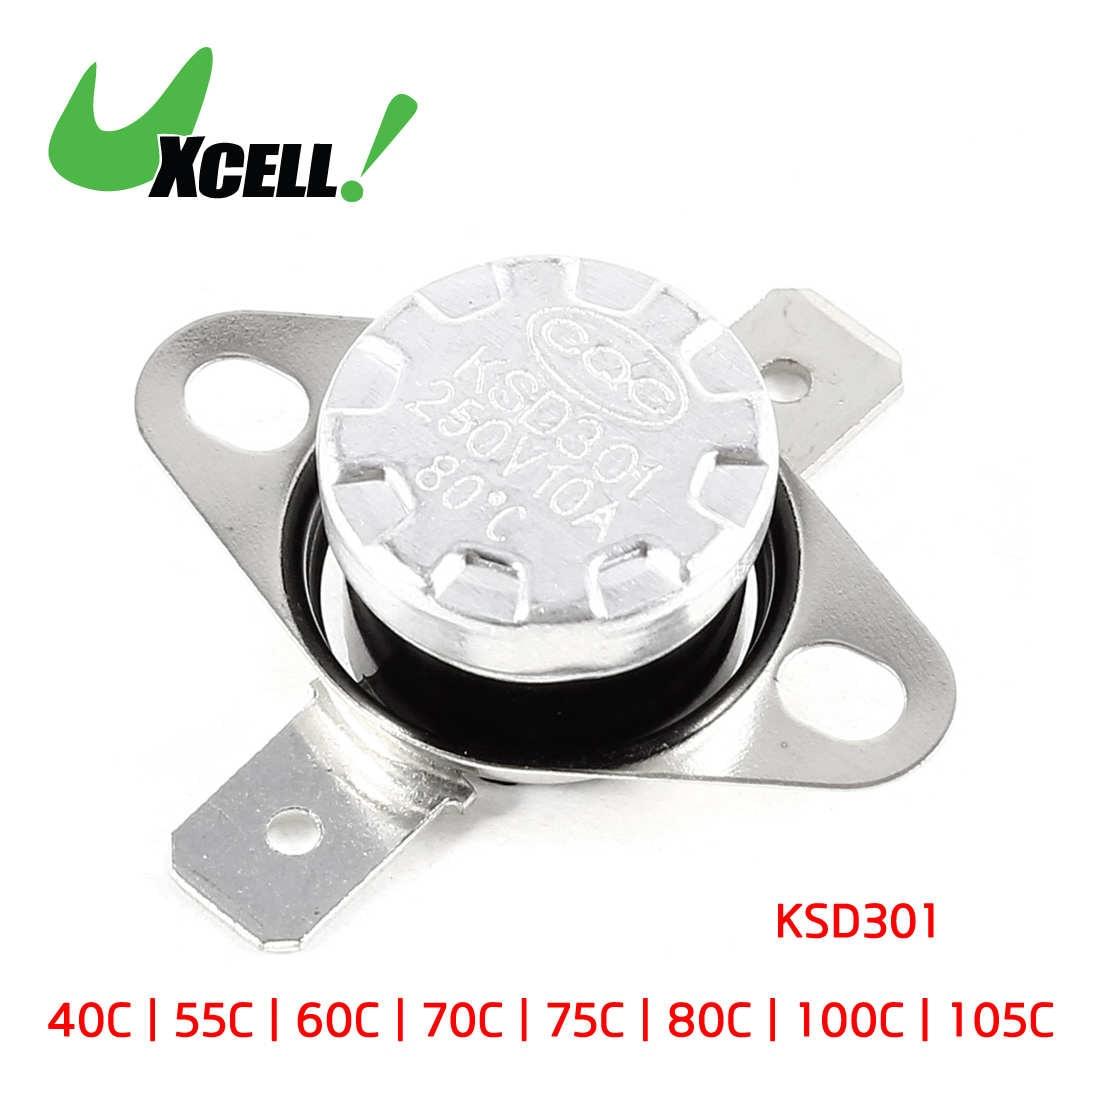 KSD301 AC 250V 10A 120C Celsius NC Temperature Control Switch Thermostat